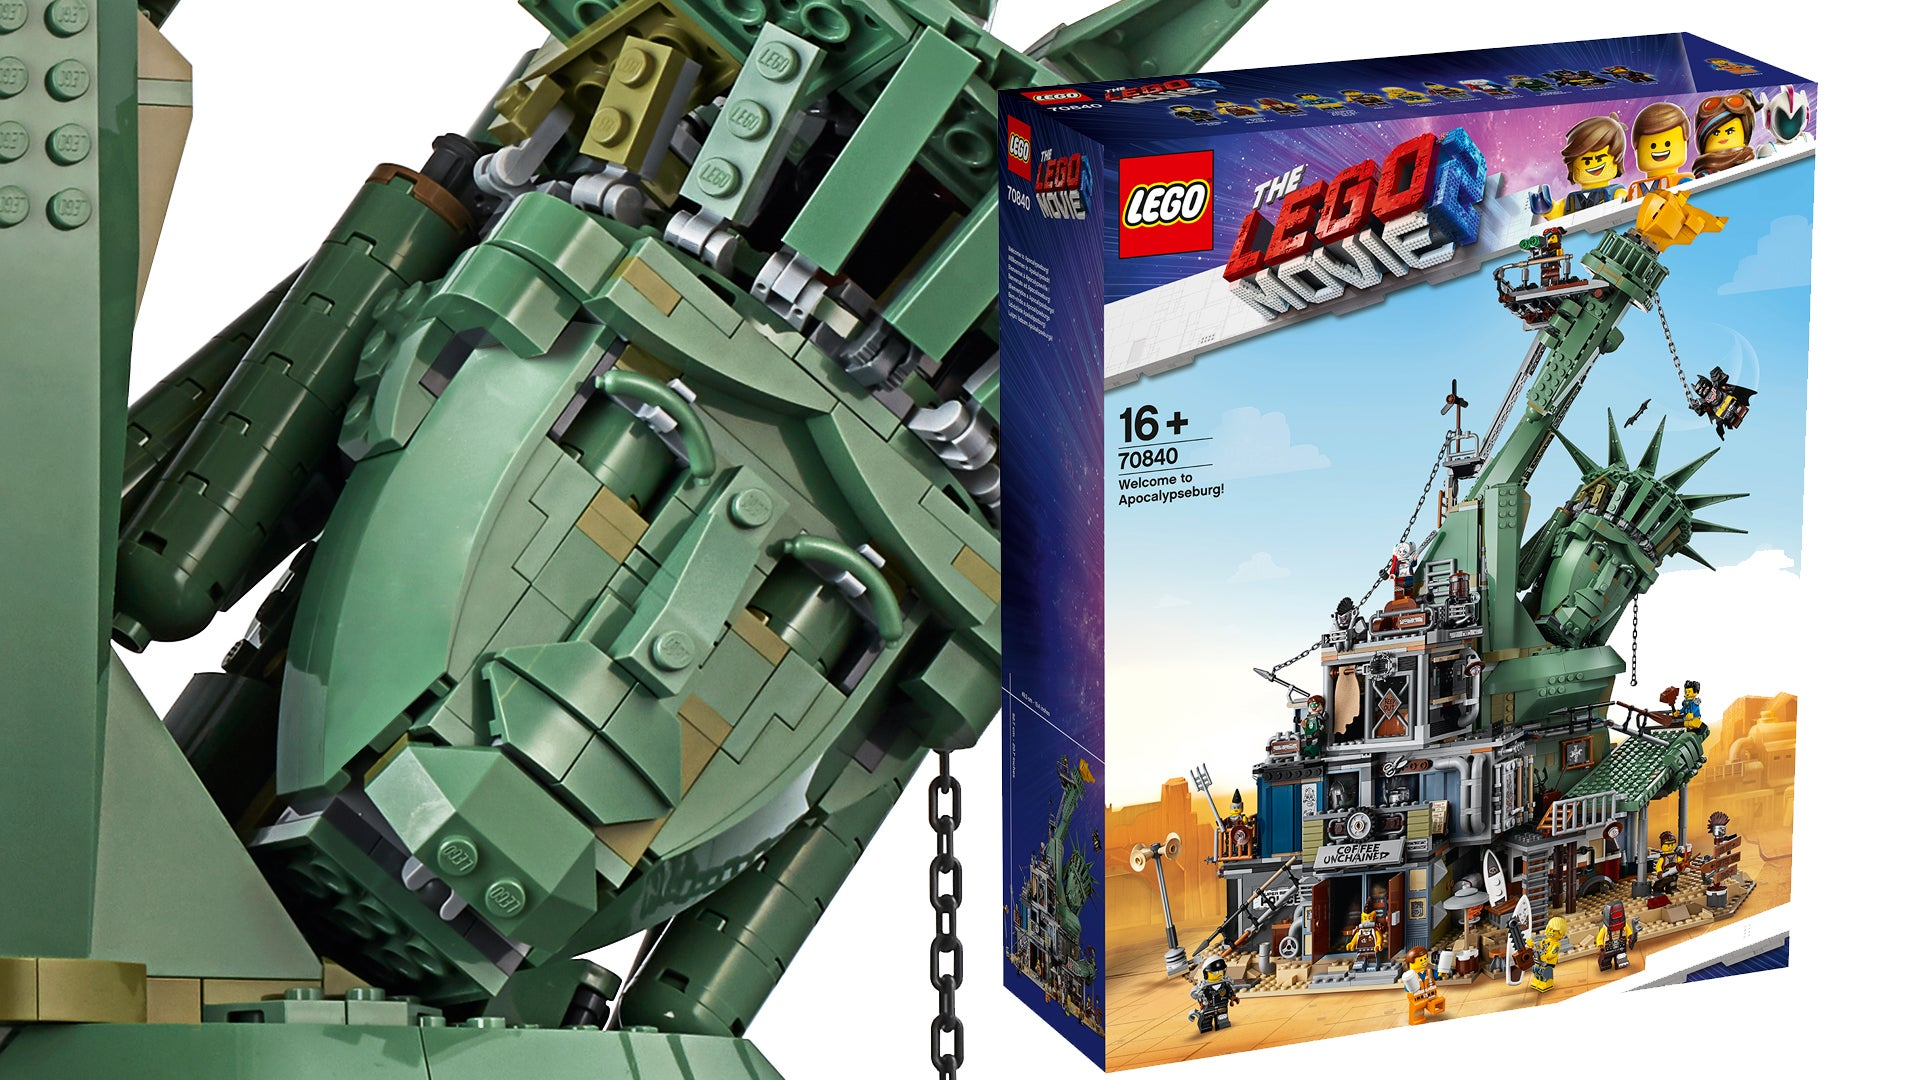 Welcome To Apocalypseburg Is The Biggest Lego MovieSet Yet